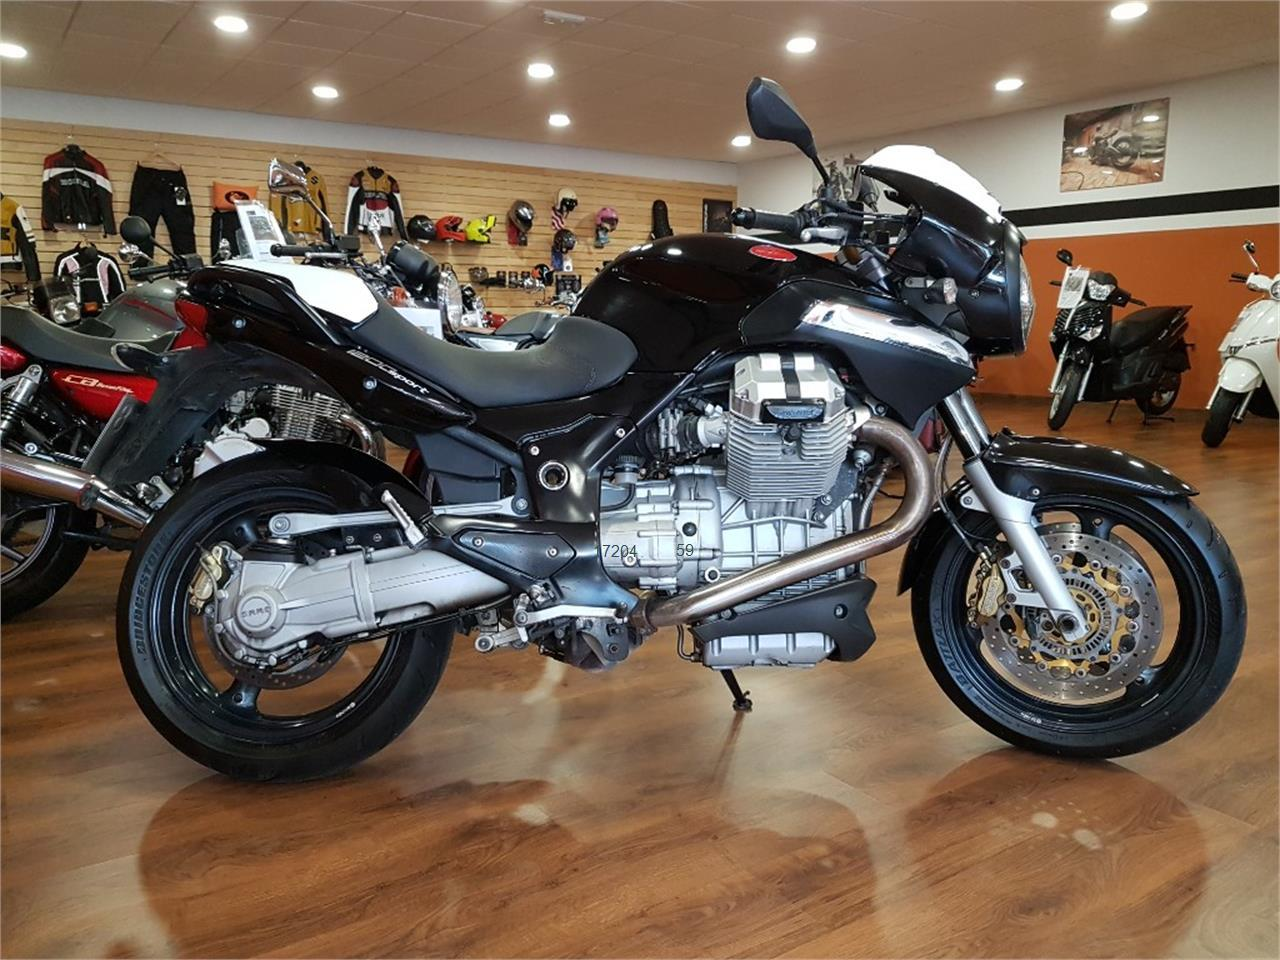 MOTO GUZZI 1200 Sport 4V ABS de venta